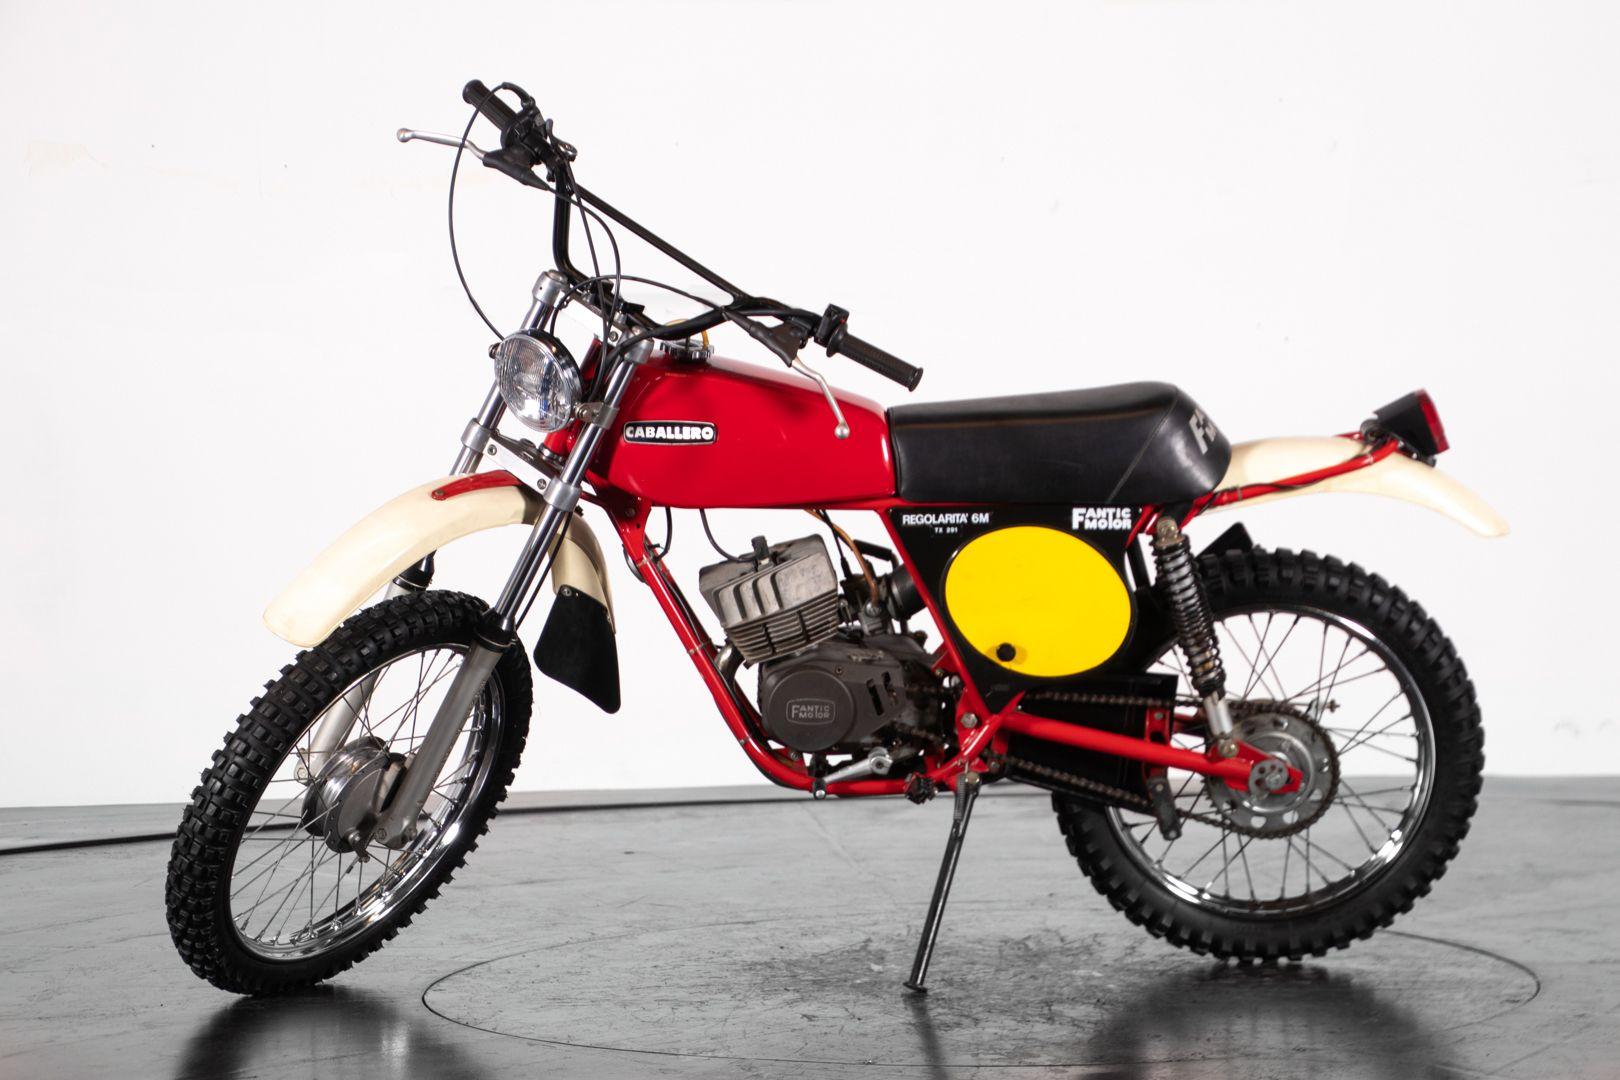 1979 FANTIC MOTOR TX 291 49349